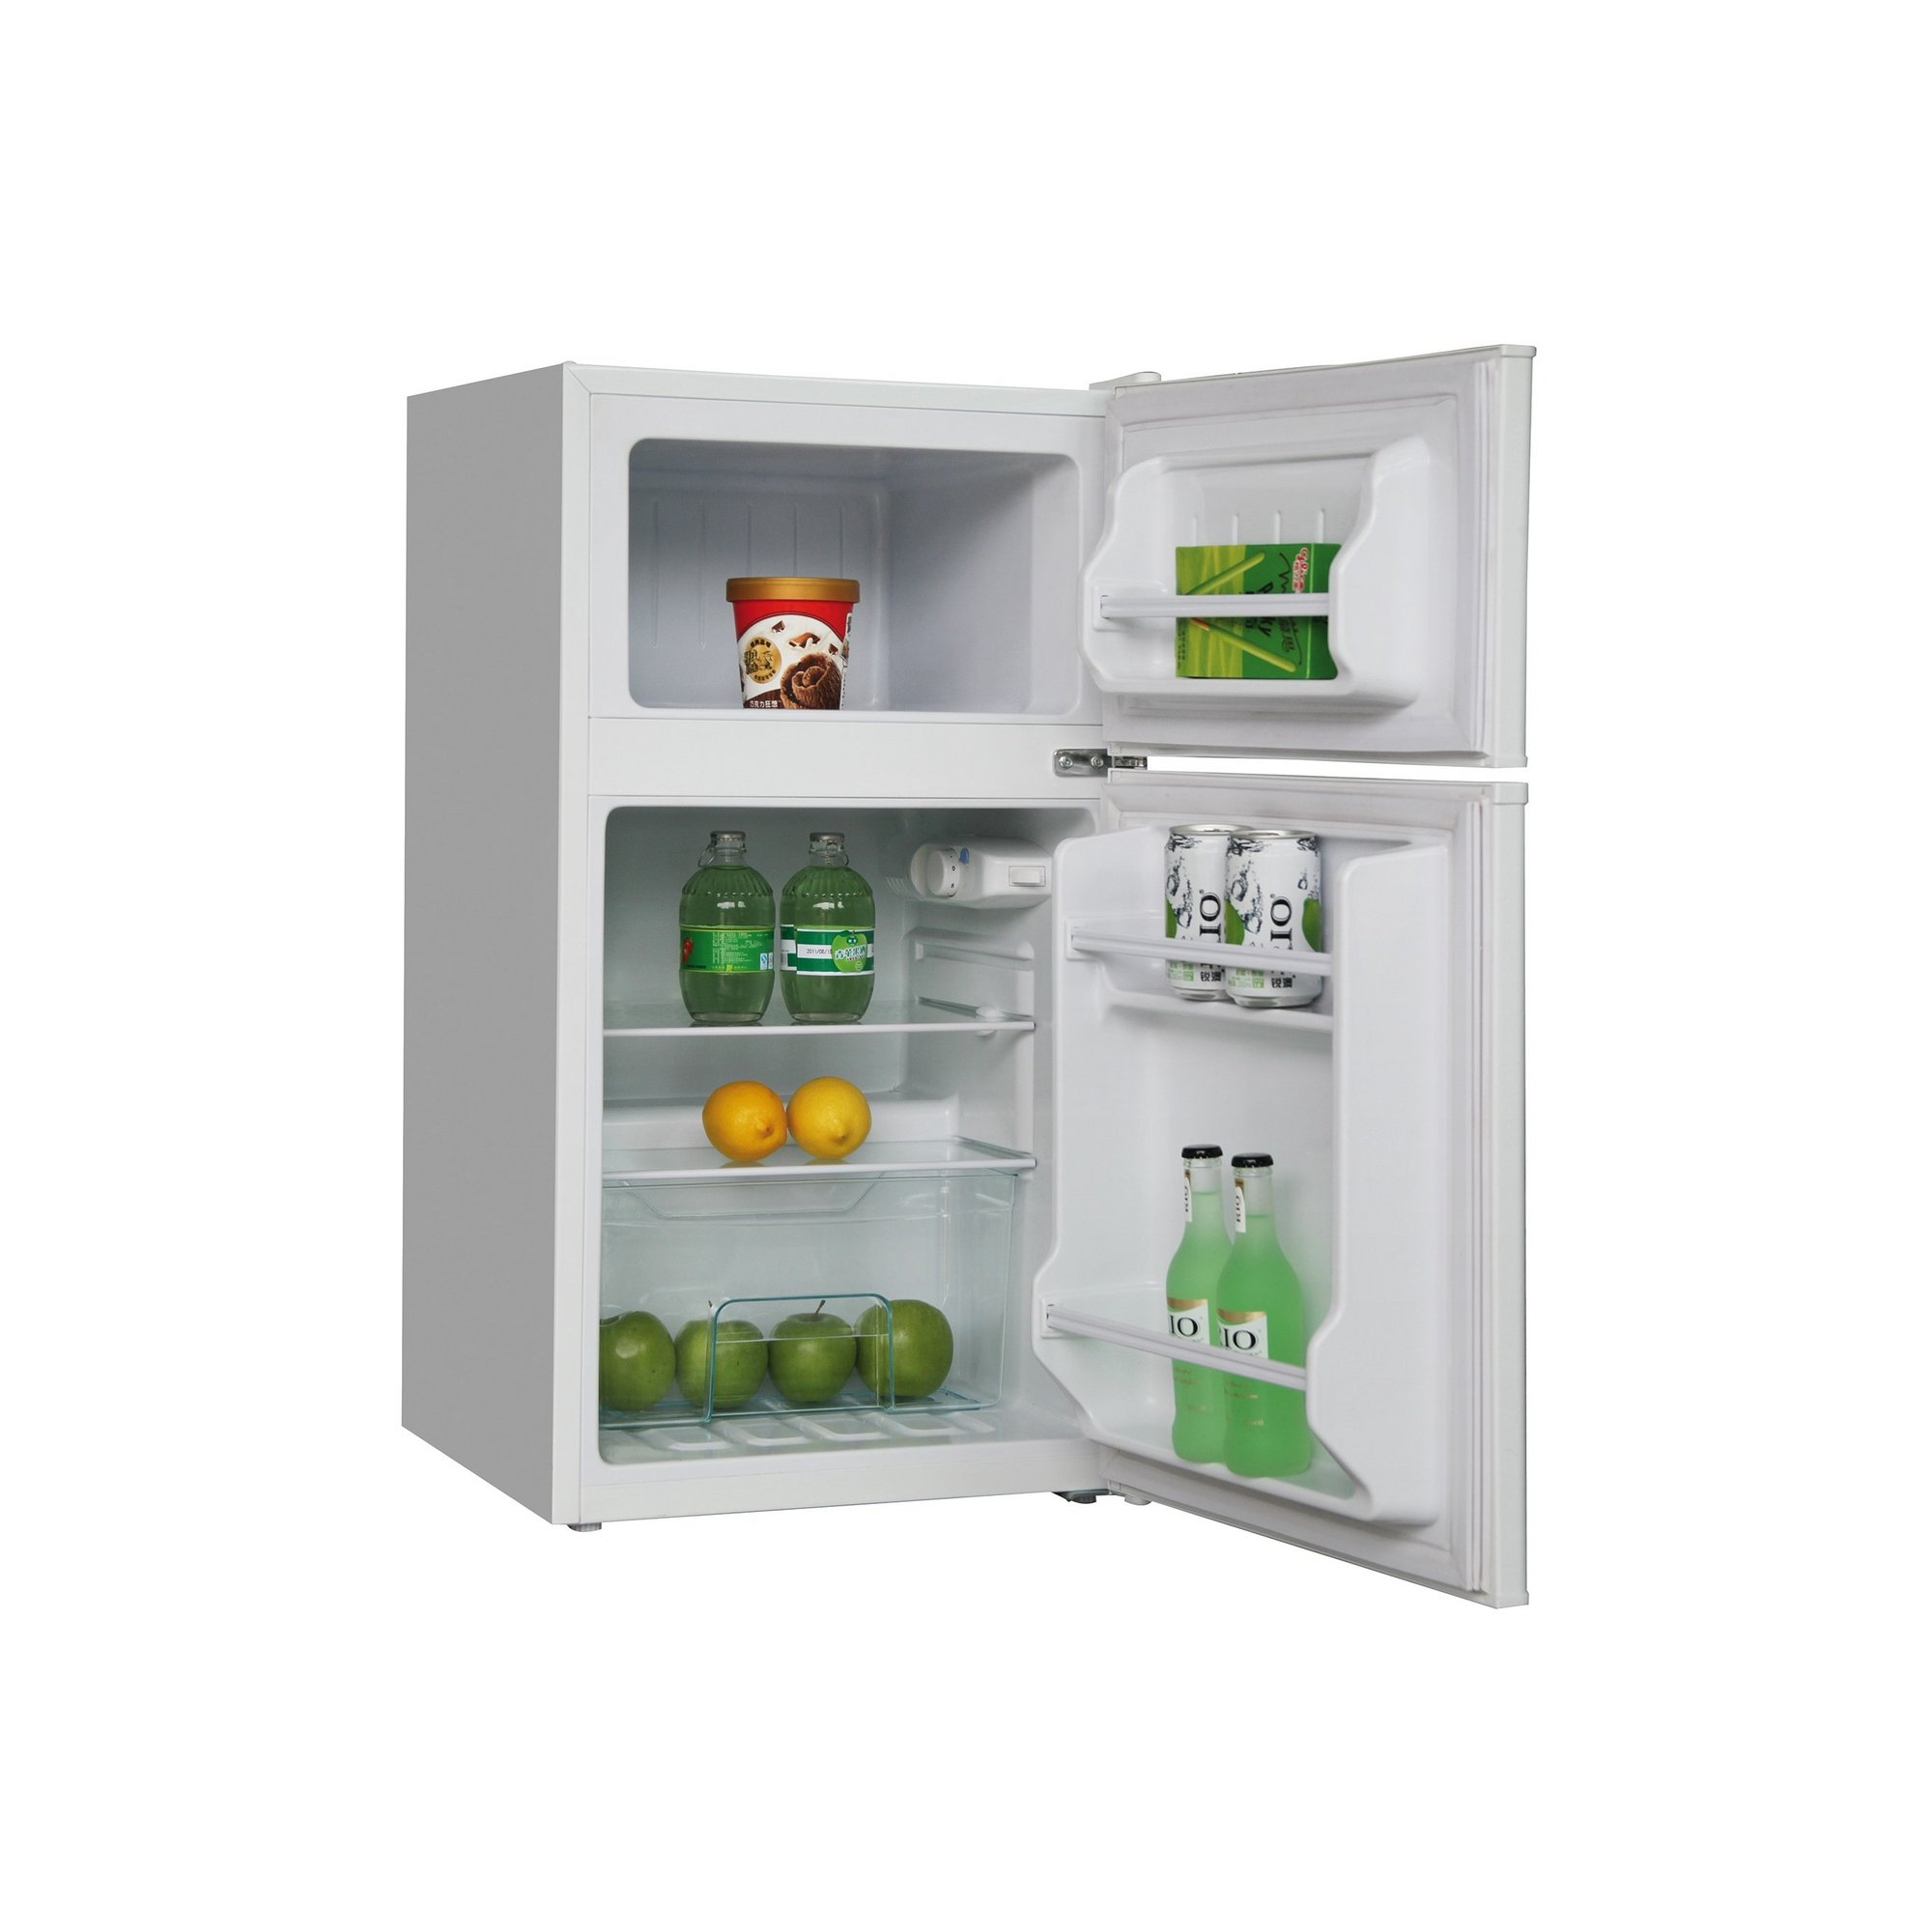 Image of 45cm Under Counter Fridge Freezer